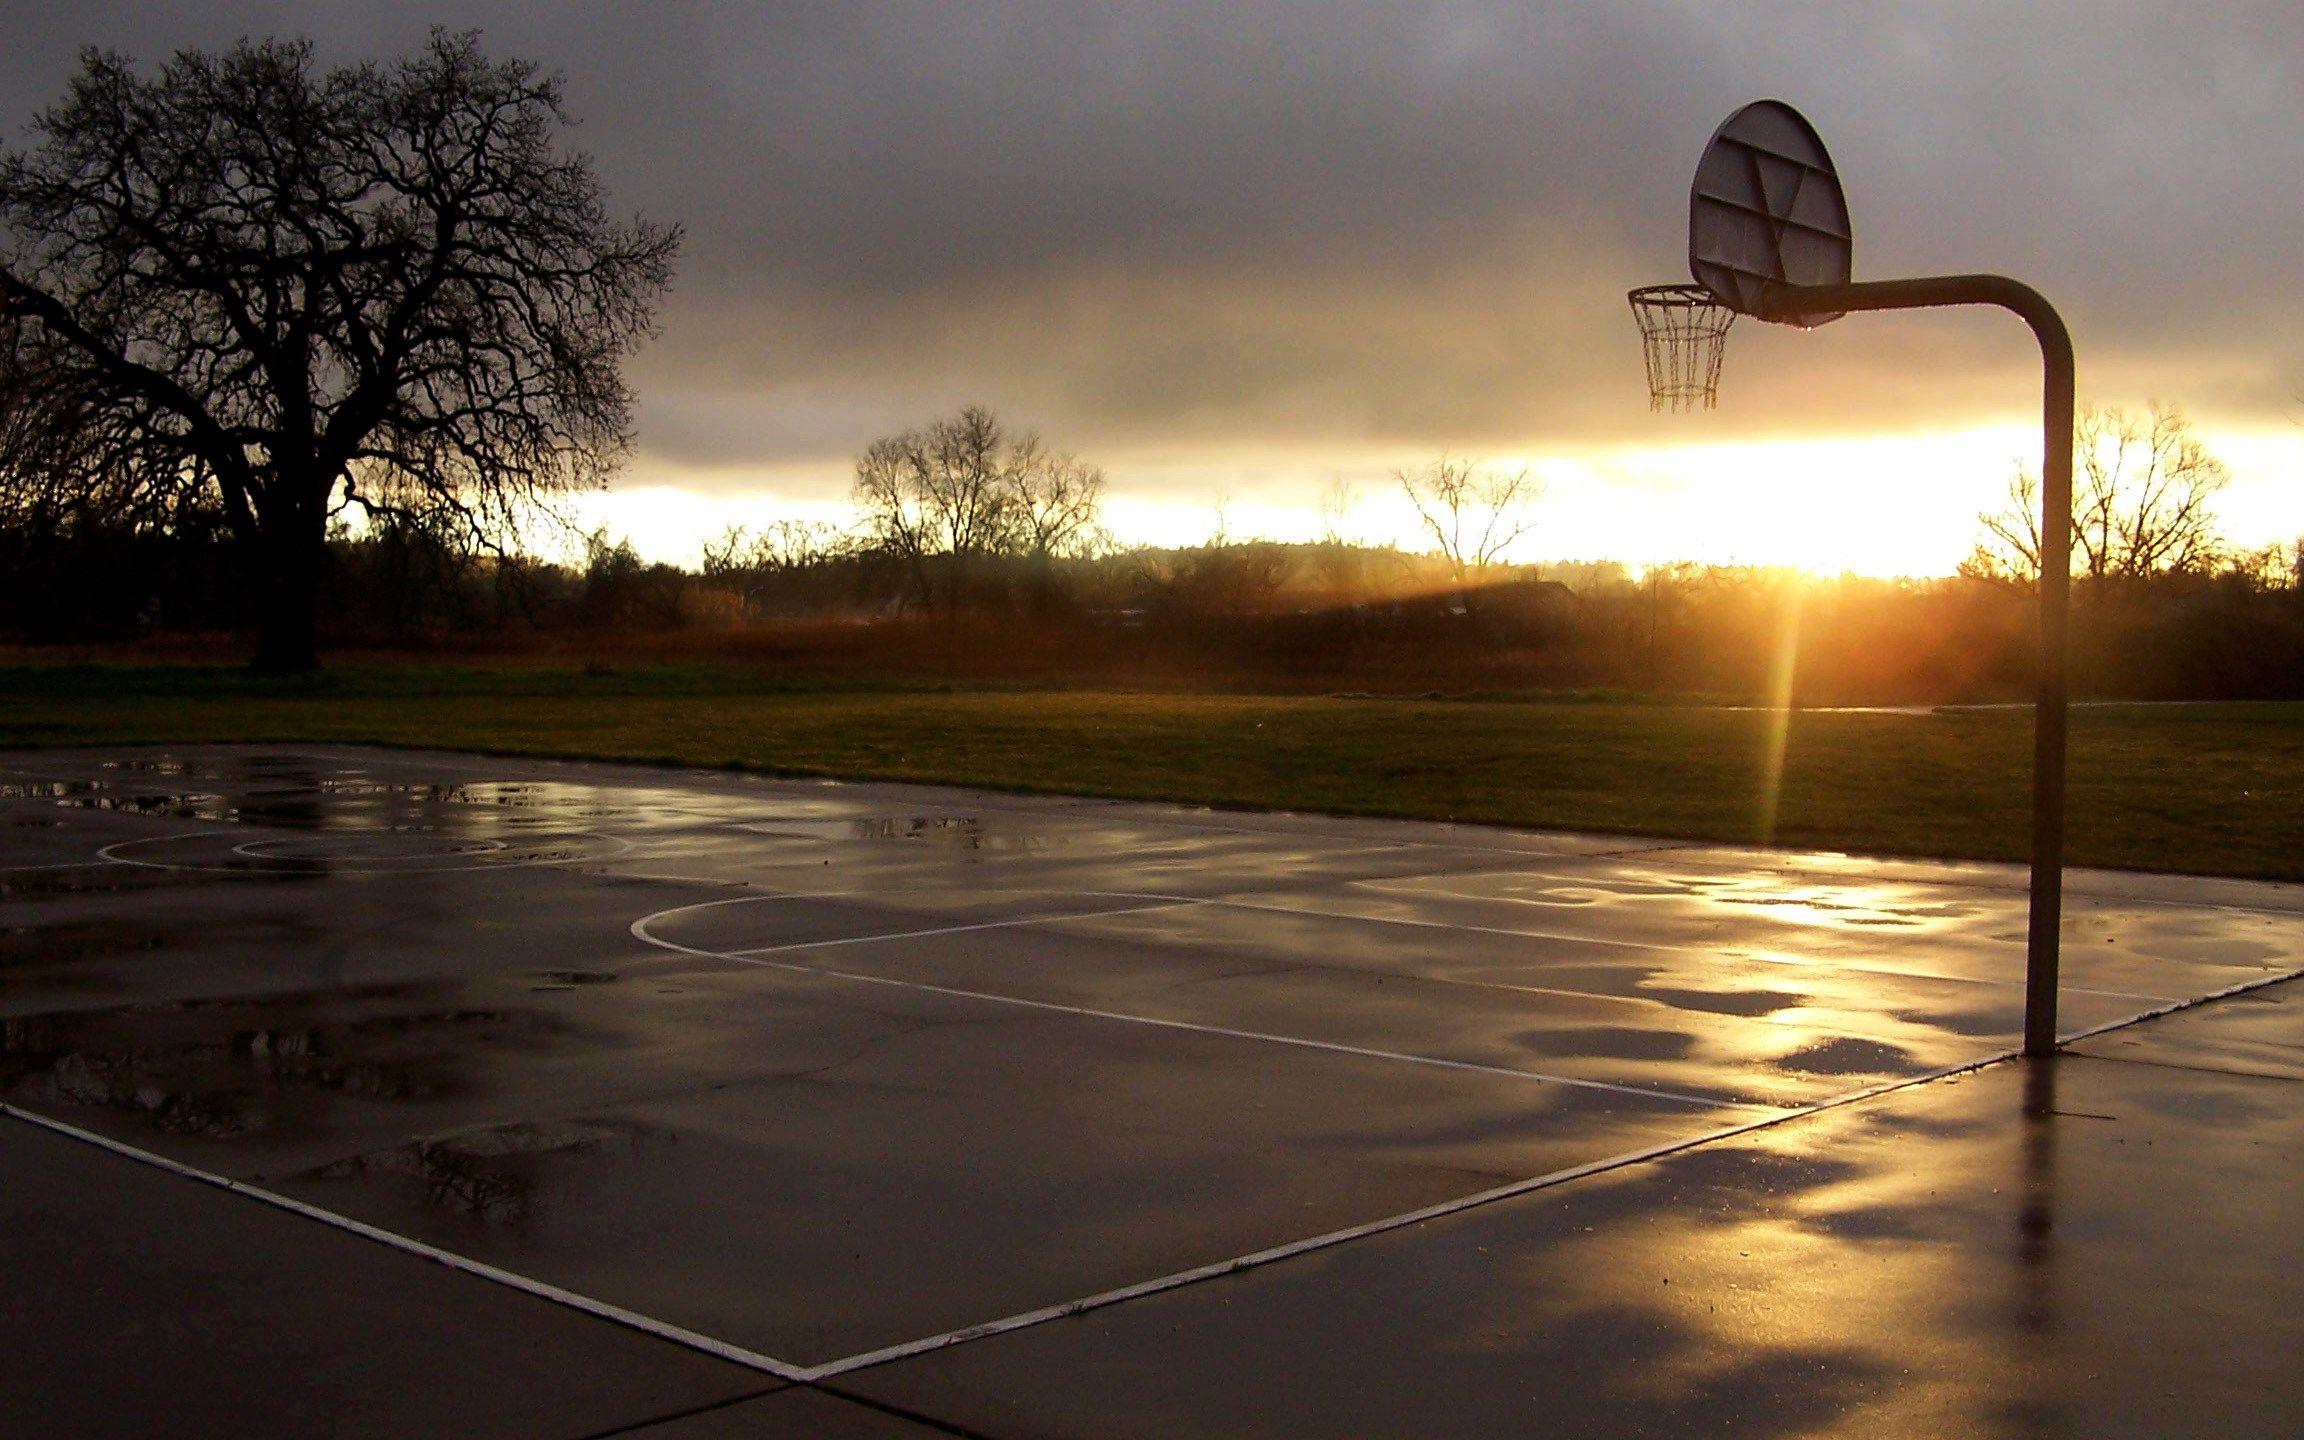 Free Desktop Basketball Backgrounds